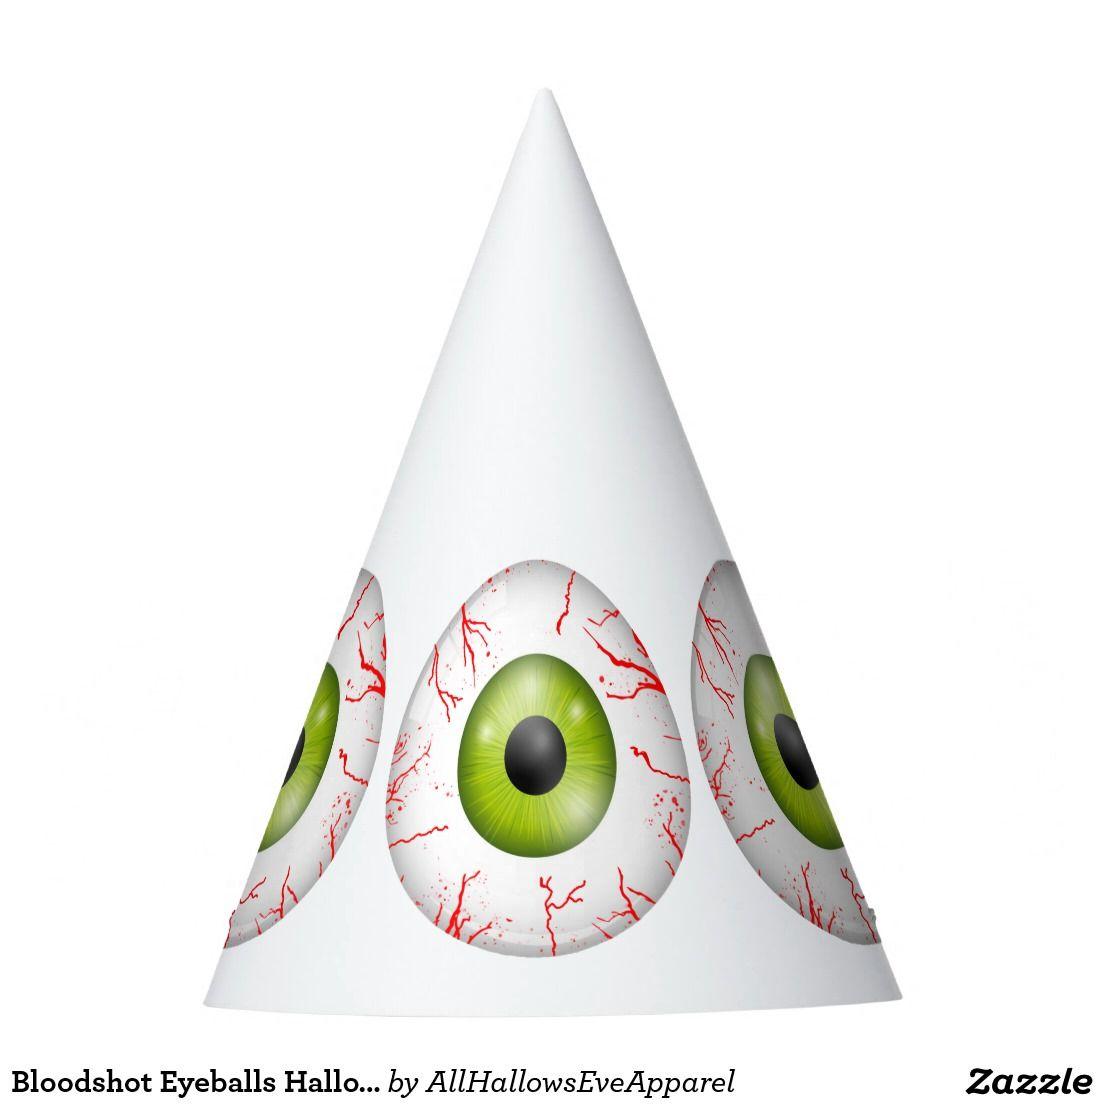 Bloodshot Eyeballs Halloween Party Hats